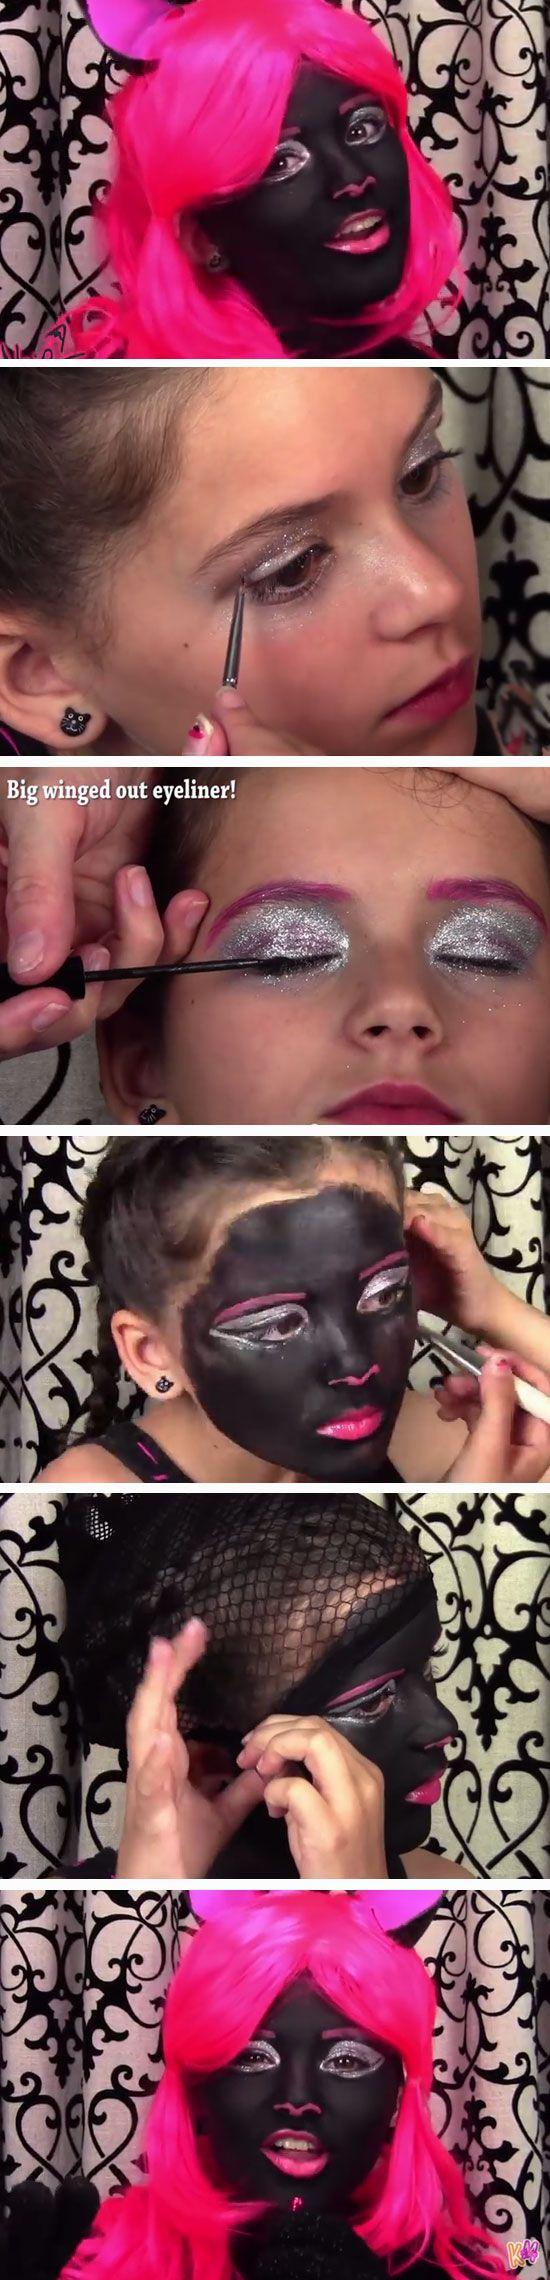 Monster High Catty Noir | DIY Face Painting Ideas for Kids | Easy Halloween Makeup Ideas for Kids